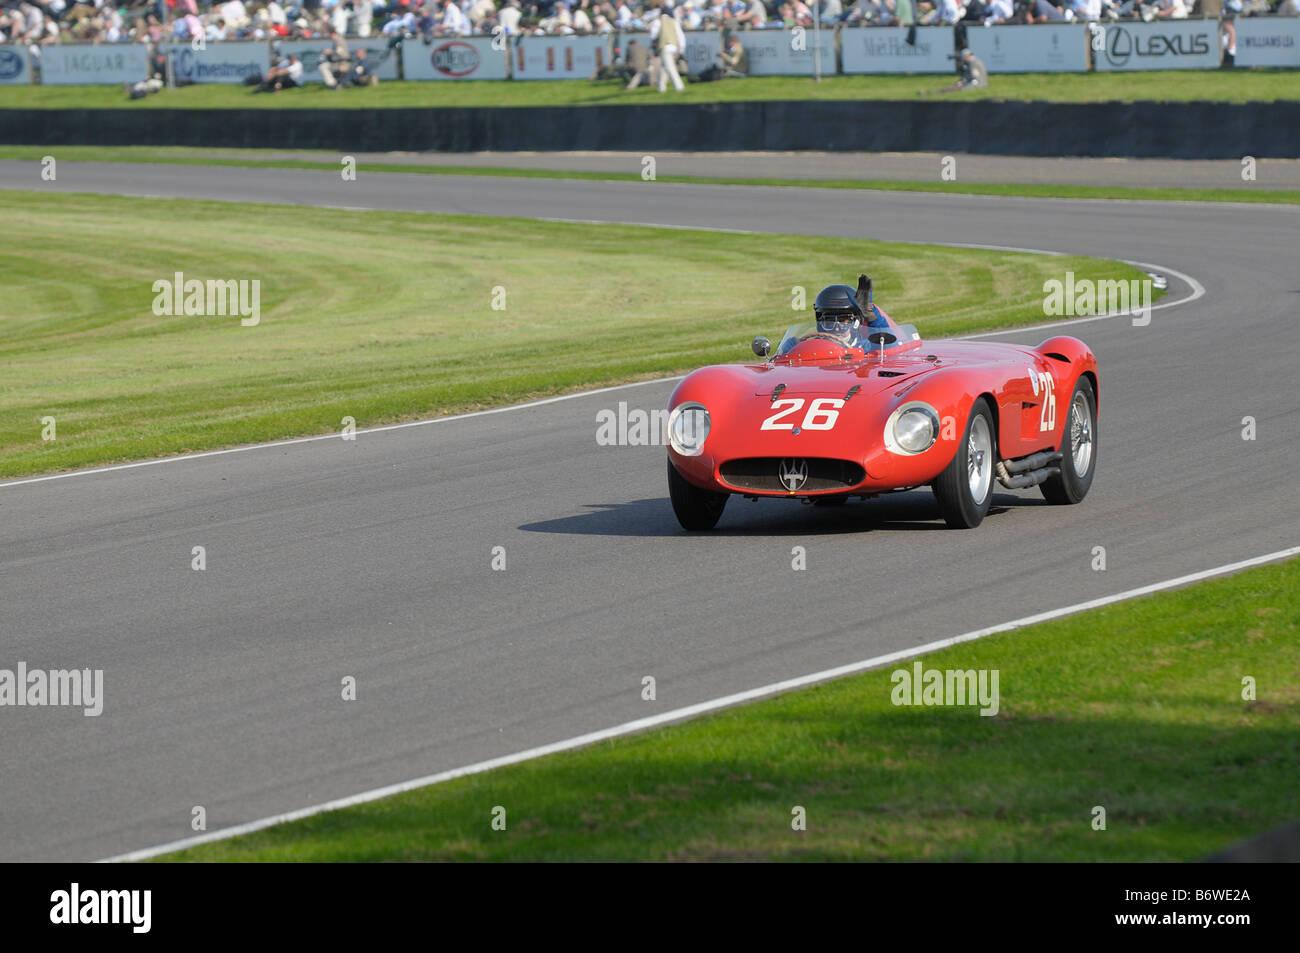 Beim Goodwood Revival meeting September 2008 Maserati 300 s 1955 2995cc Hugh Taylor Stockbild